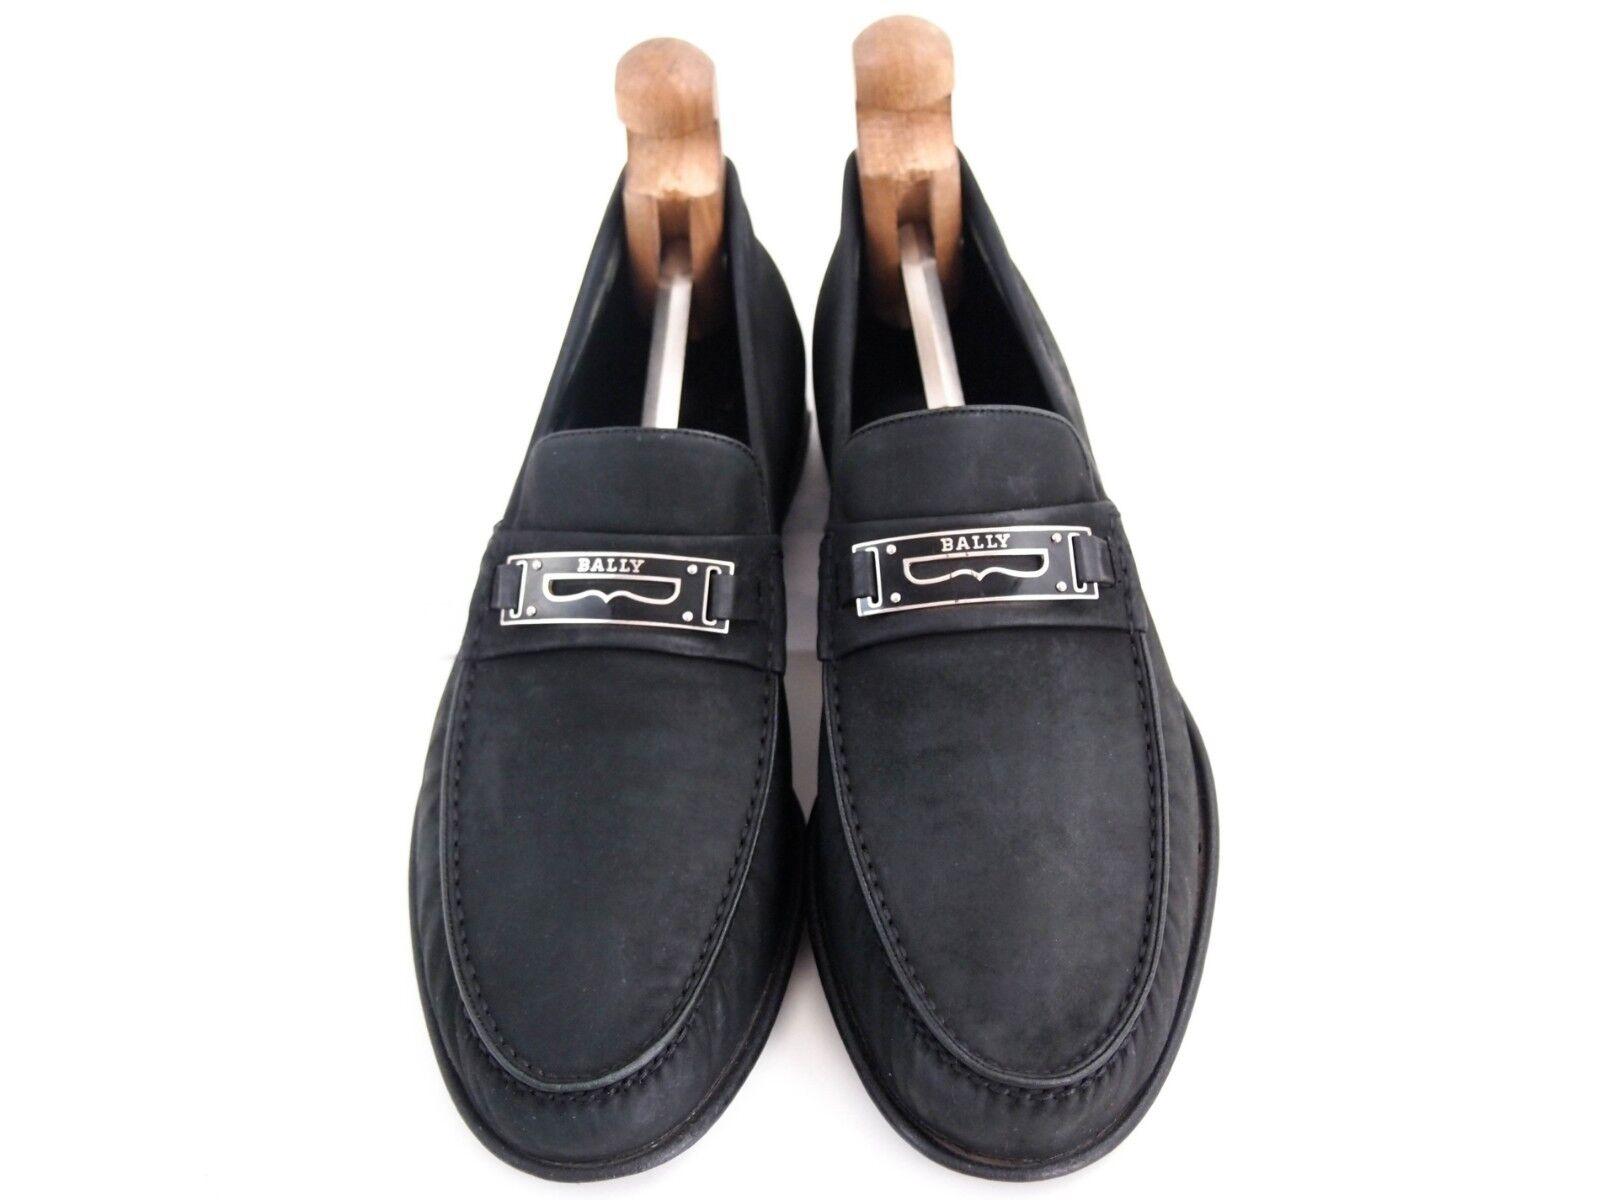 BALLY moccasin,schwarz US suede, men's shoe Größe US moccasin,schwarz 9 EU 42 420 bbec2b